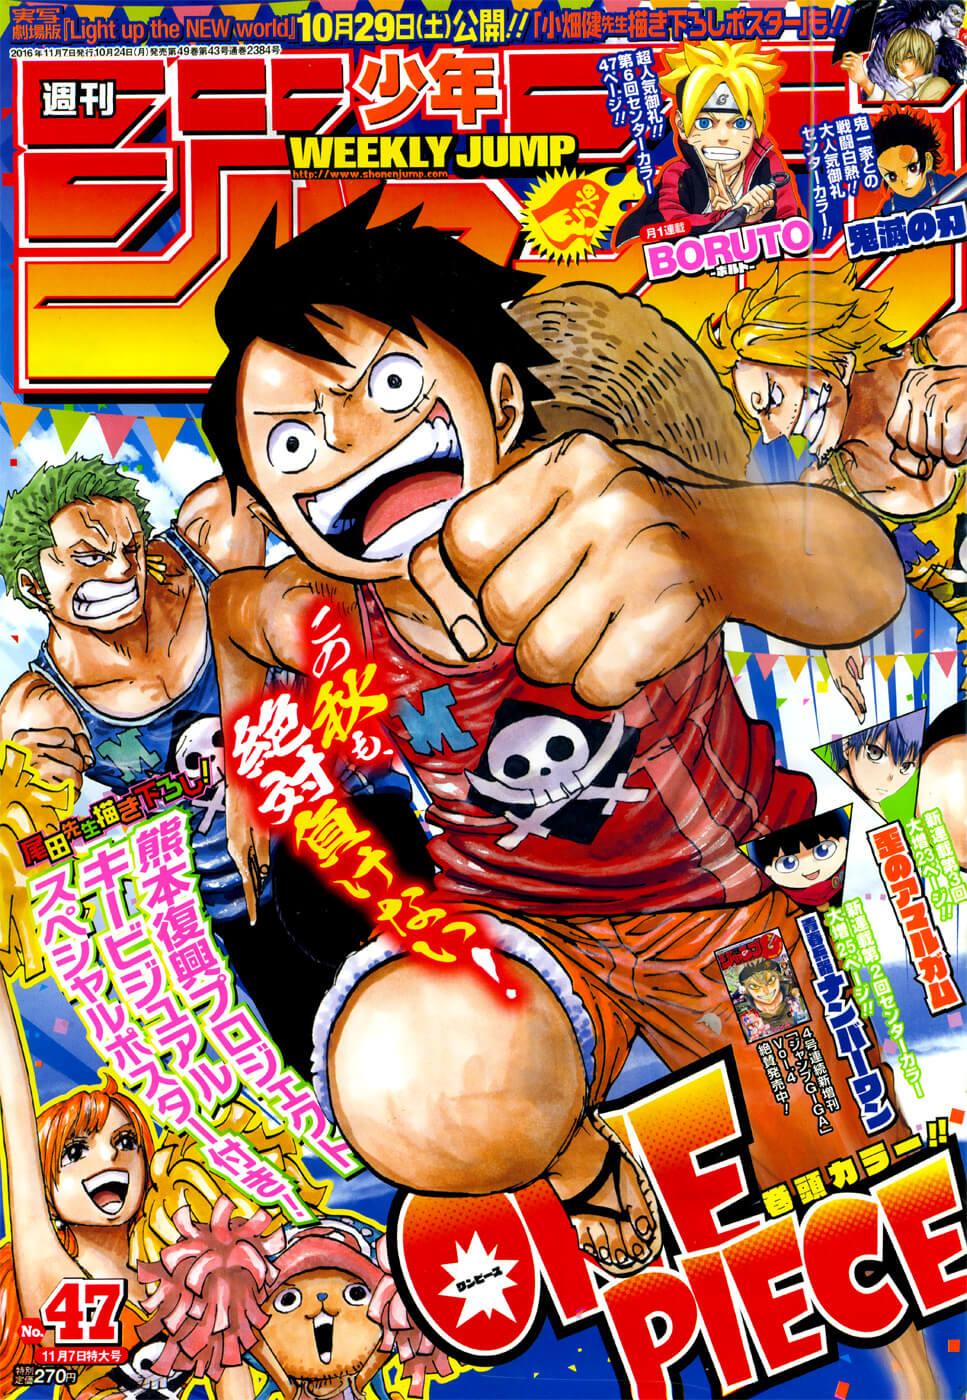 Shonen Jump Volume 47 ToC